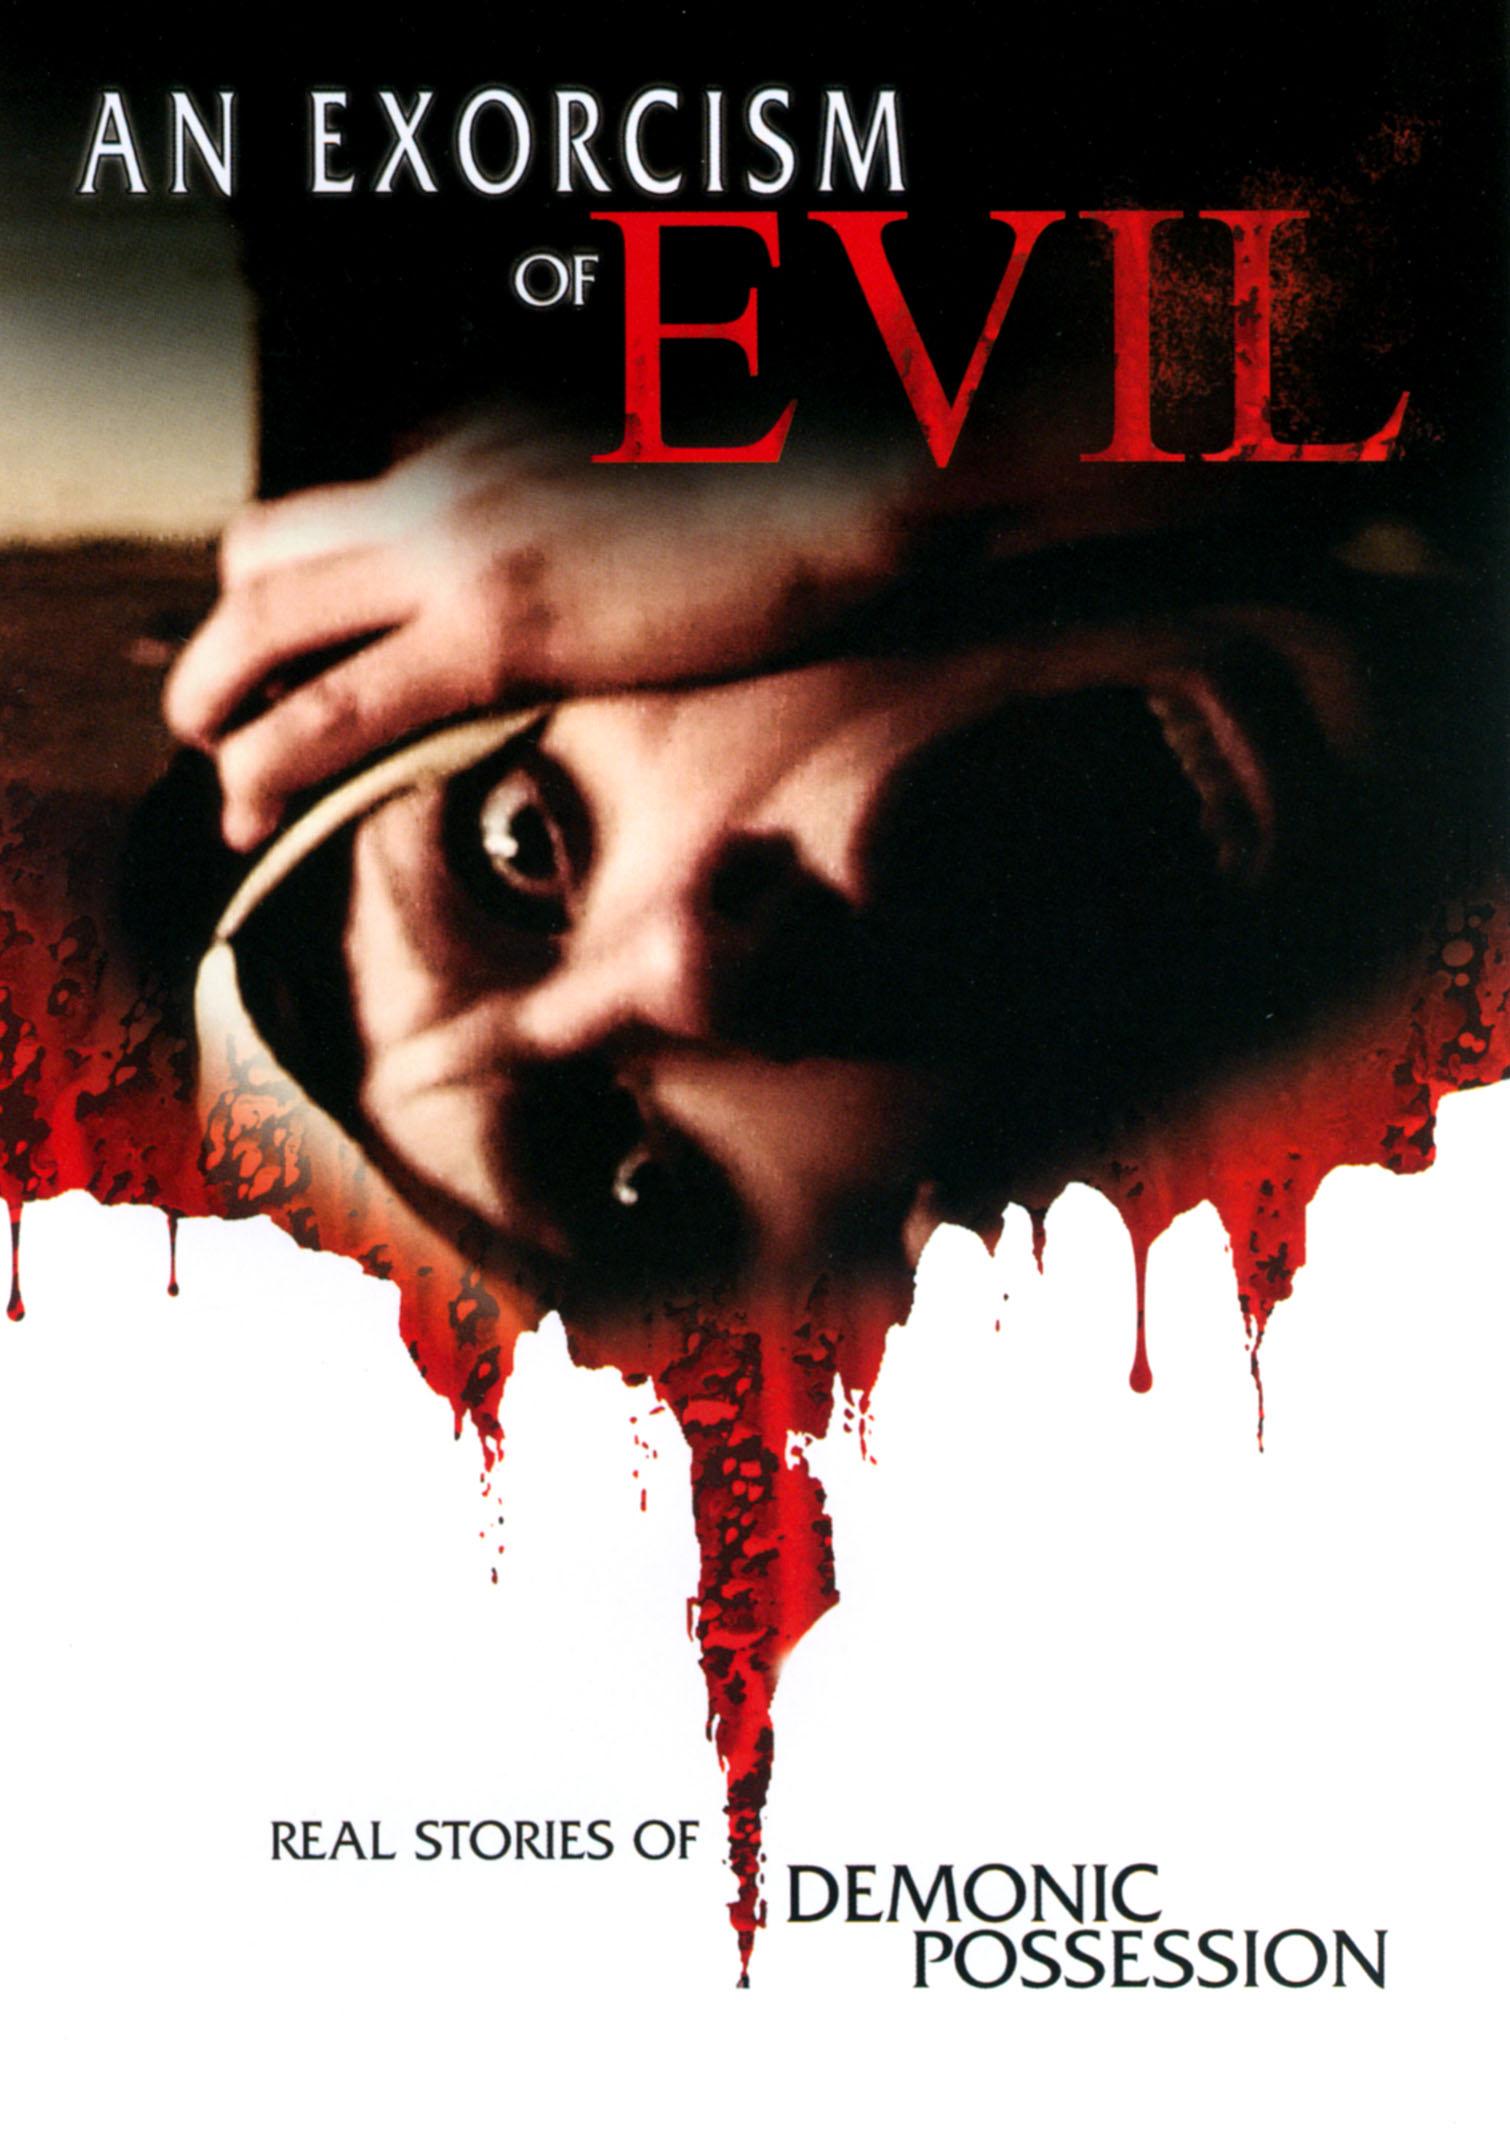 An Exorcism of Evil